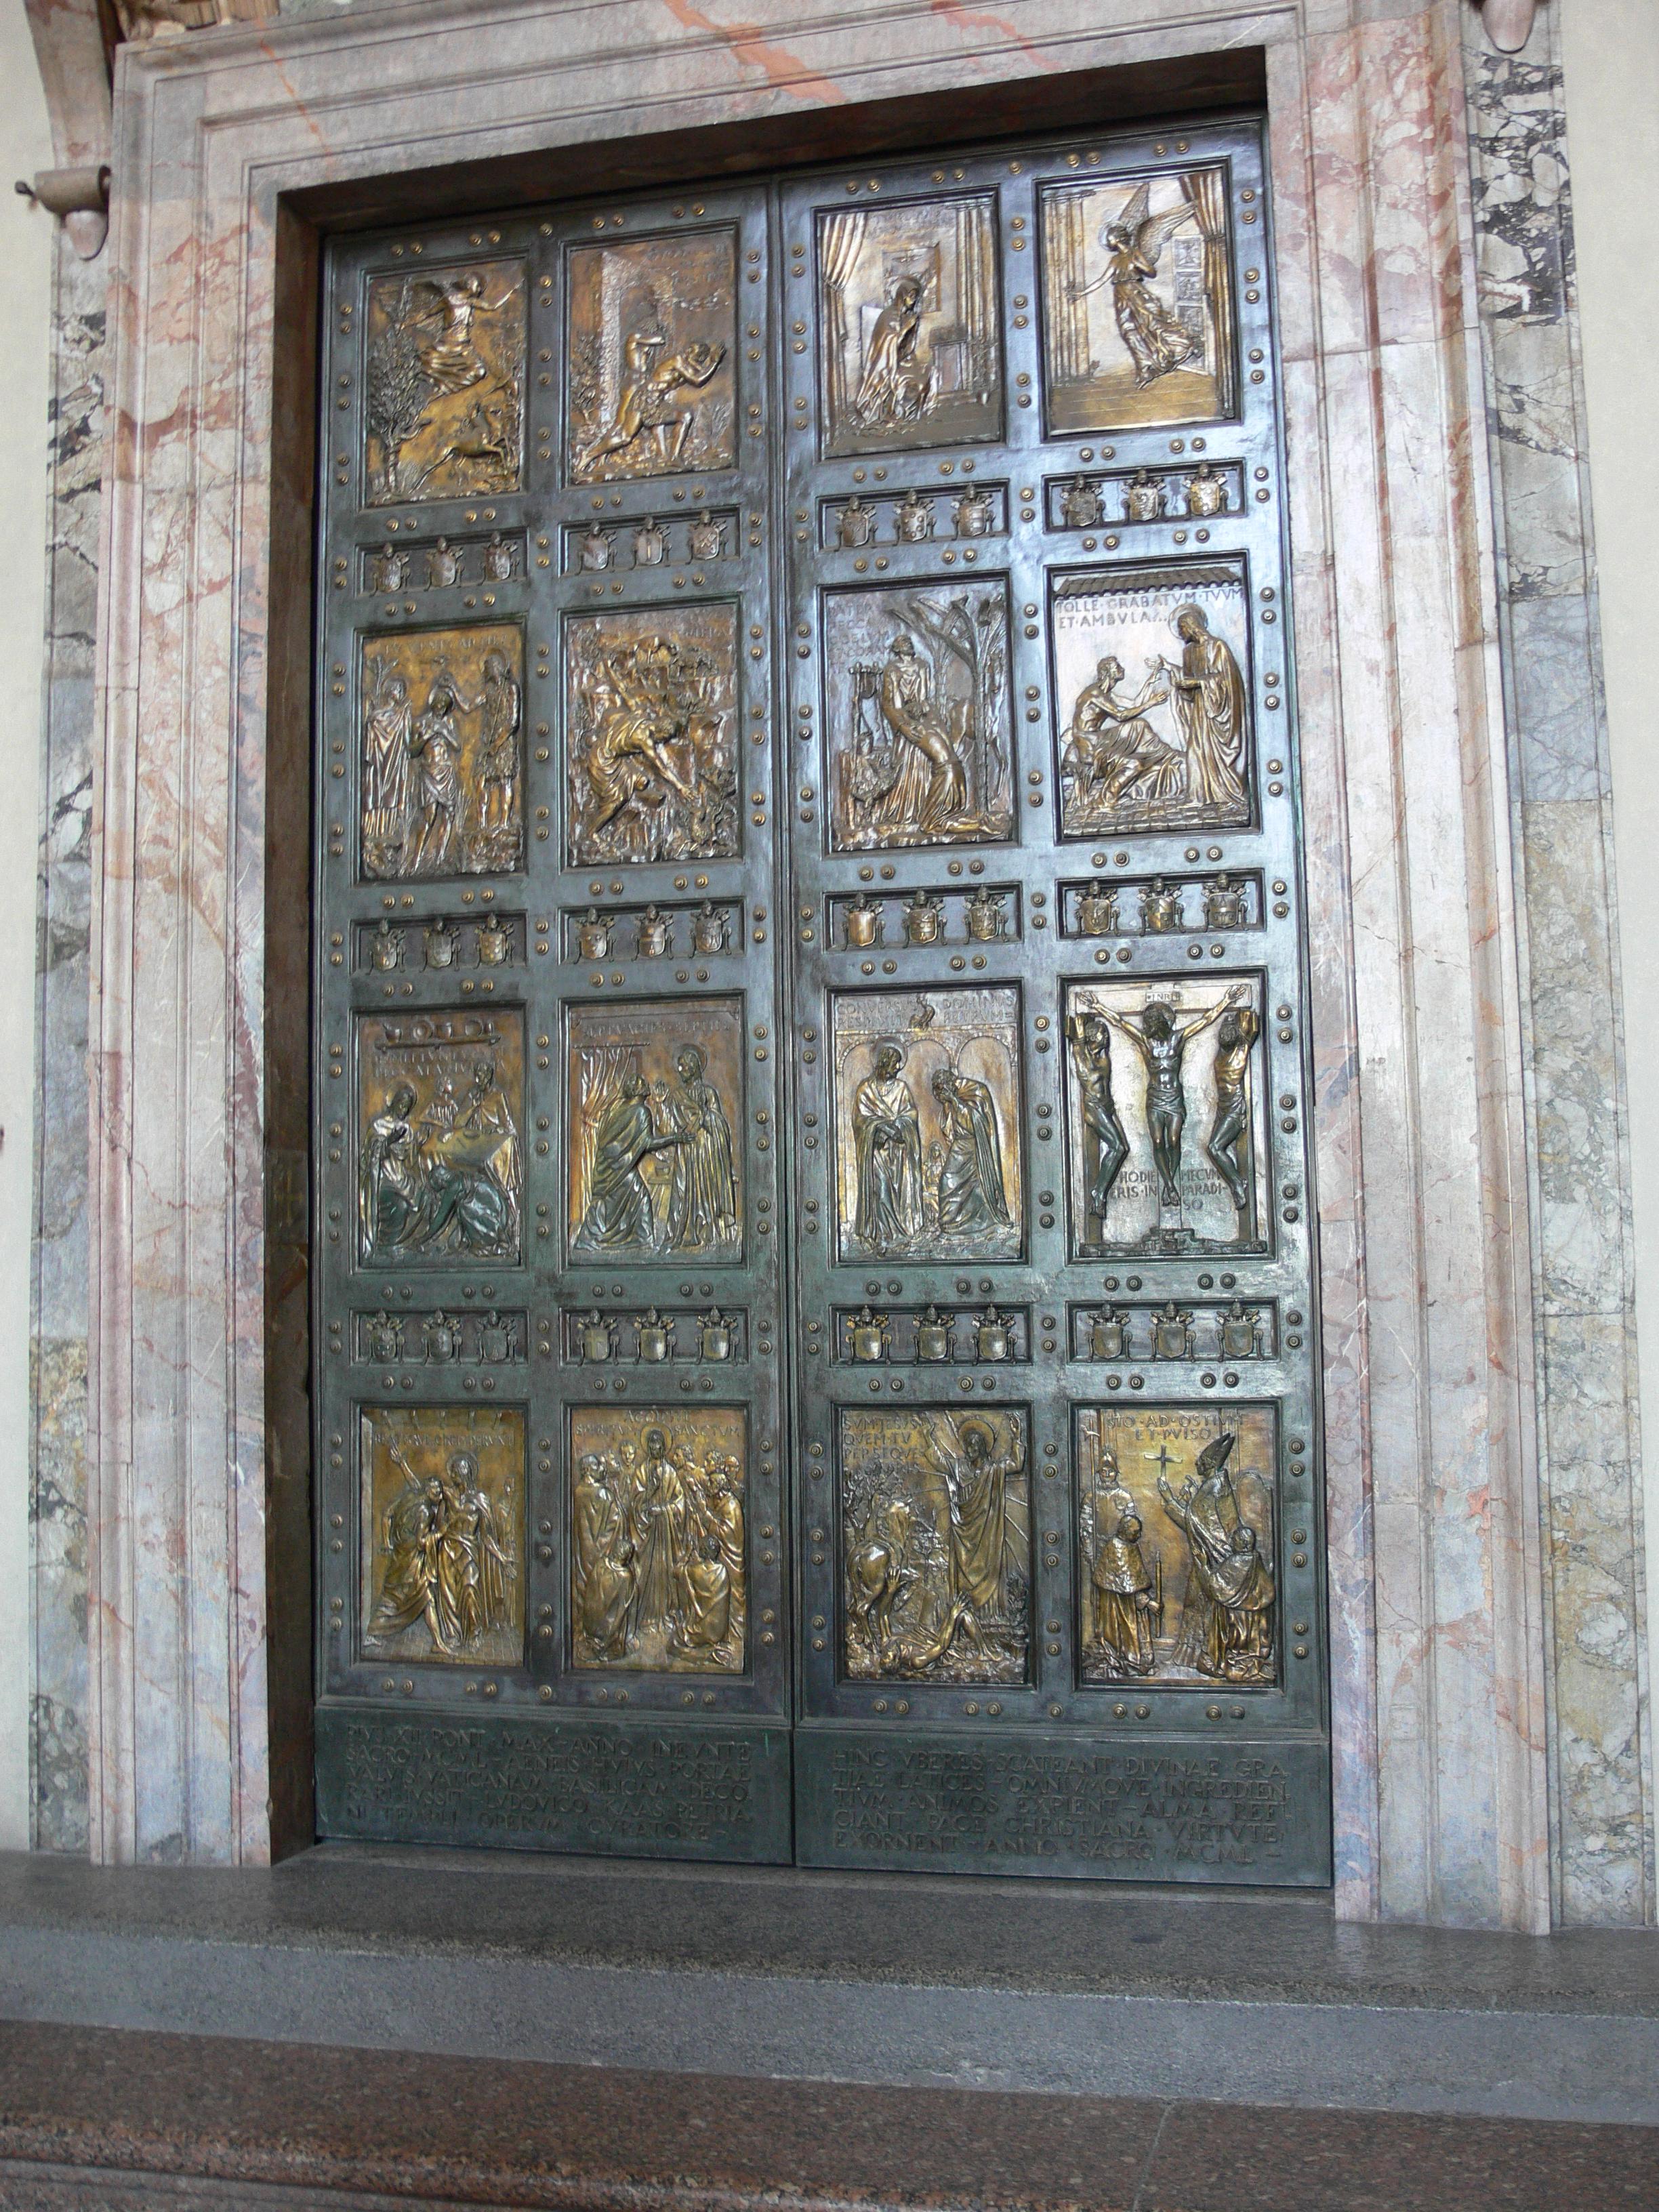 Монашеских орденов на плане собора